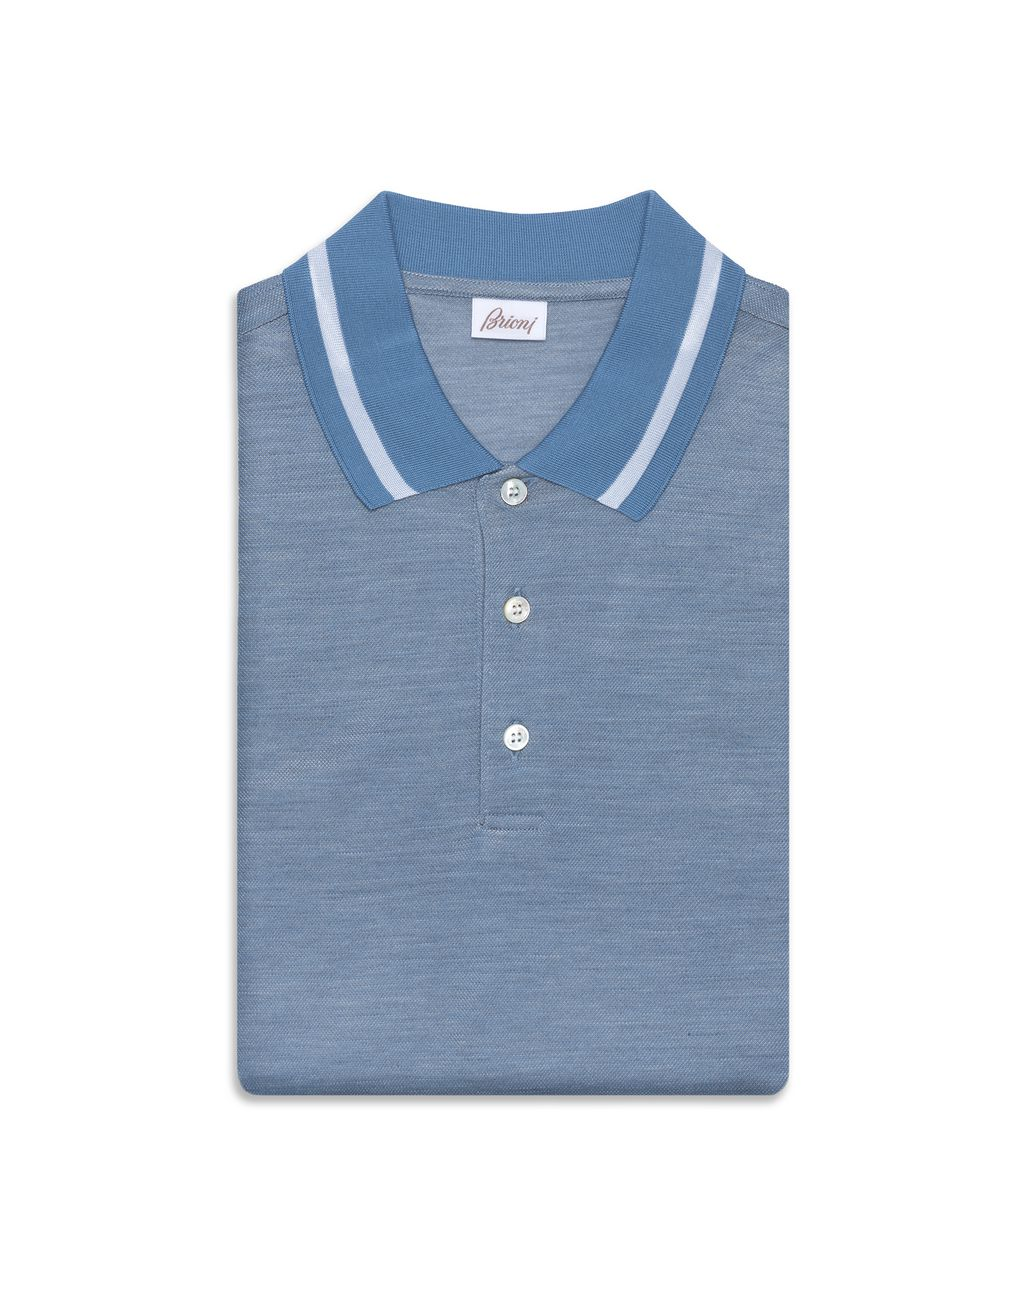 BRIONI Iridescent Sky Blue Polo Shirt T-Shirts & Polos Man f